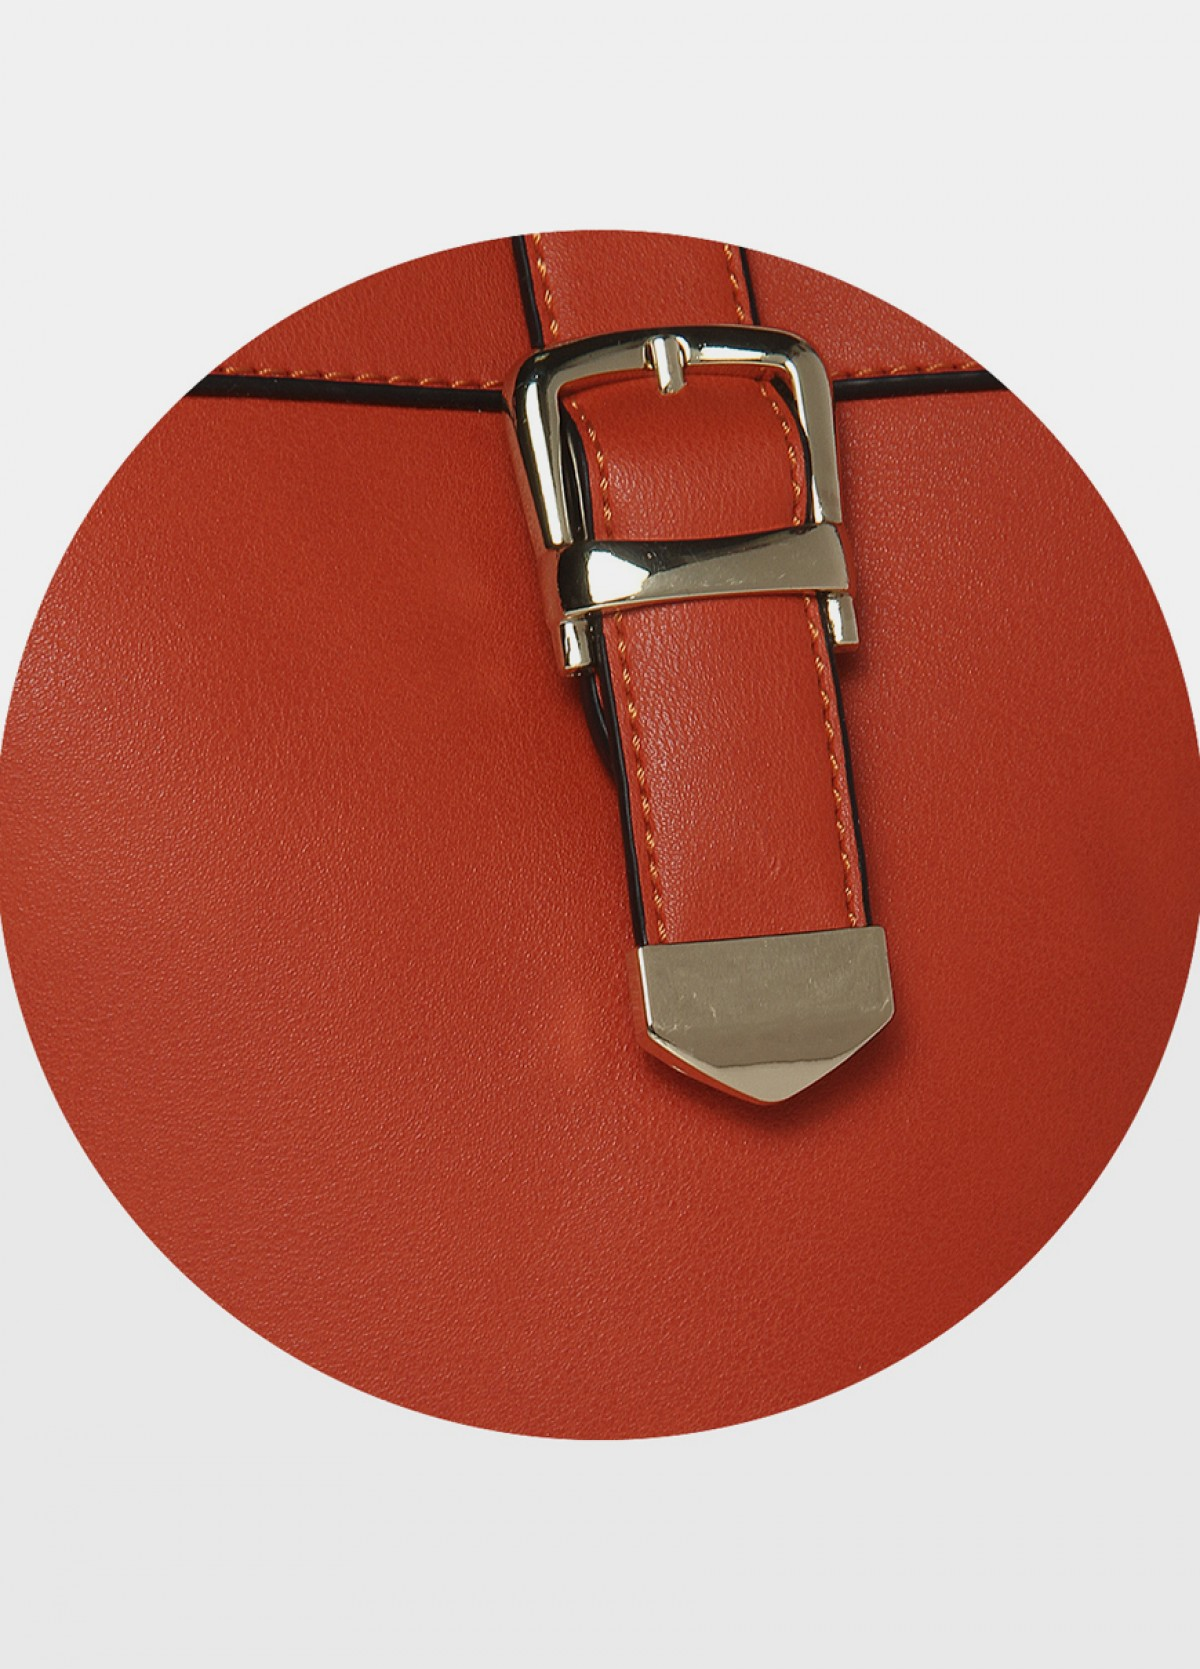 The Orange Sling Handbag